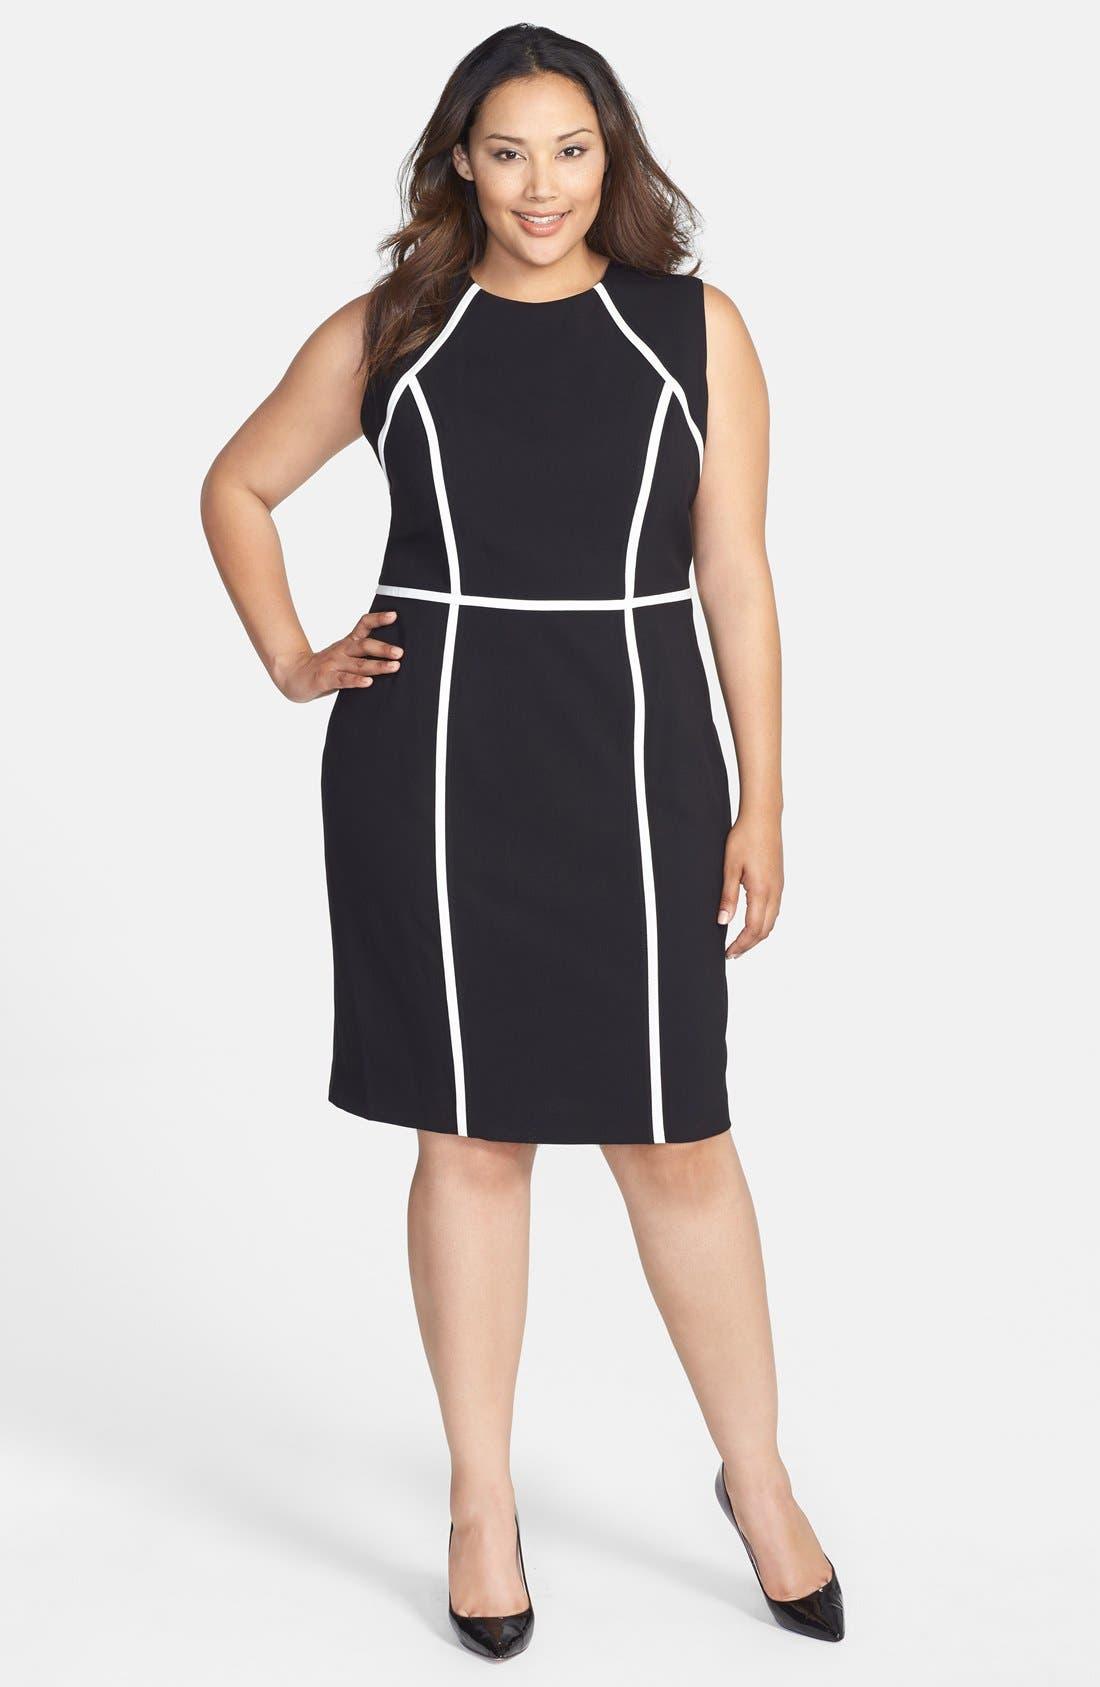 Alternate Image 1 Selected - Calvin Klein Contrast Detail Sheath Dress (Plus Size)